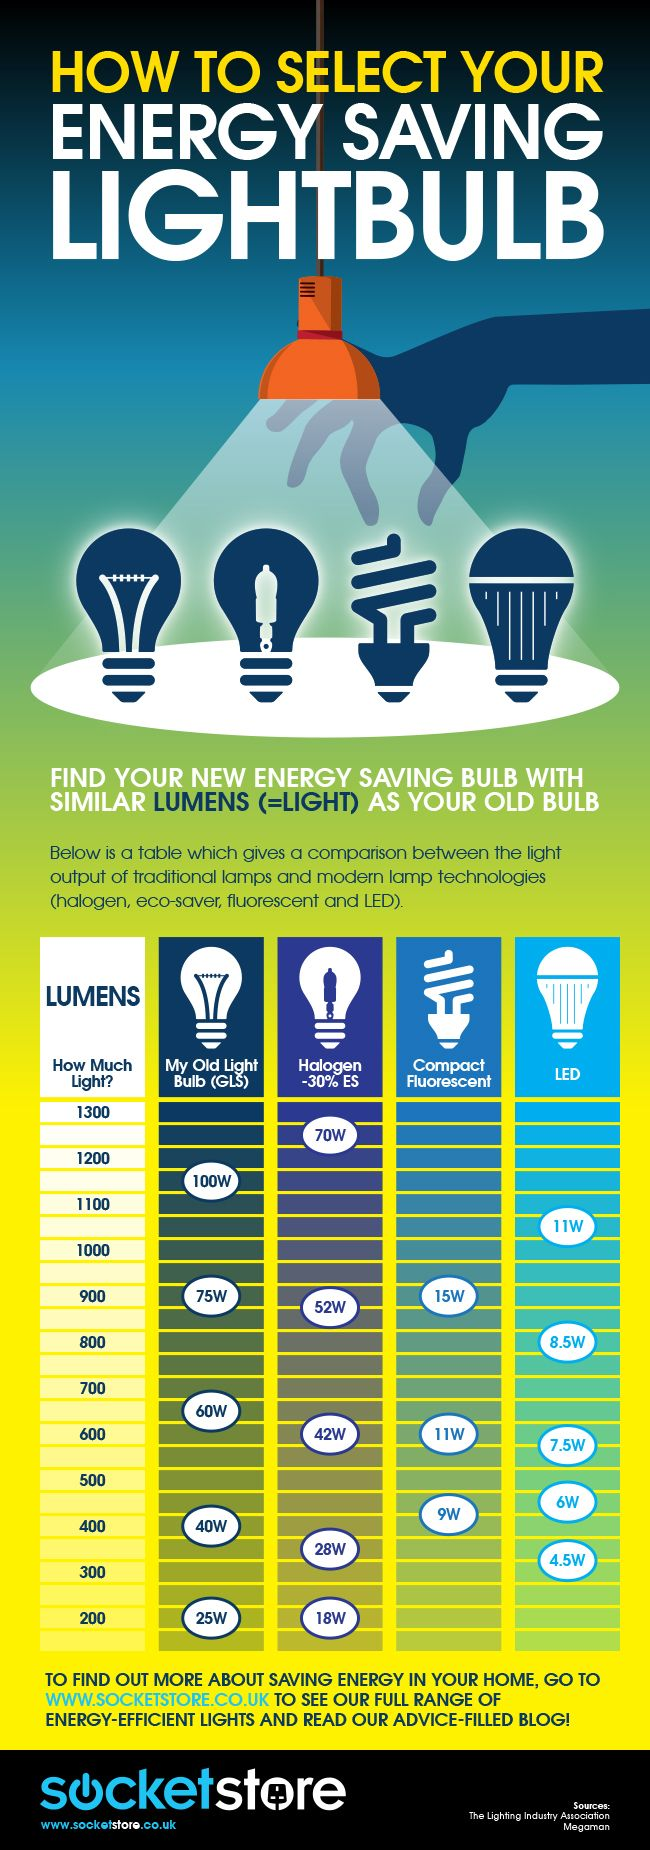 Led Look Up Chart Replacing Your Light Bulbs Infographic Energy Saving Light Bulbs Energy Saving Lighting Save Energy